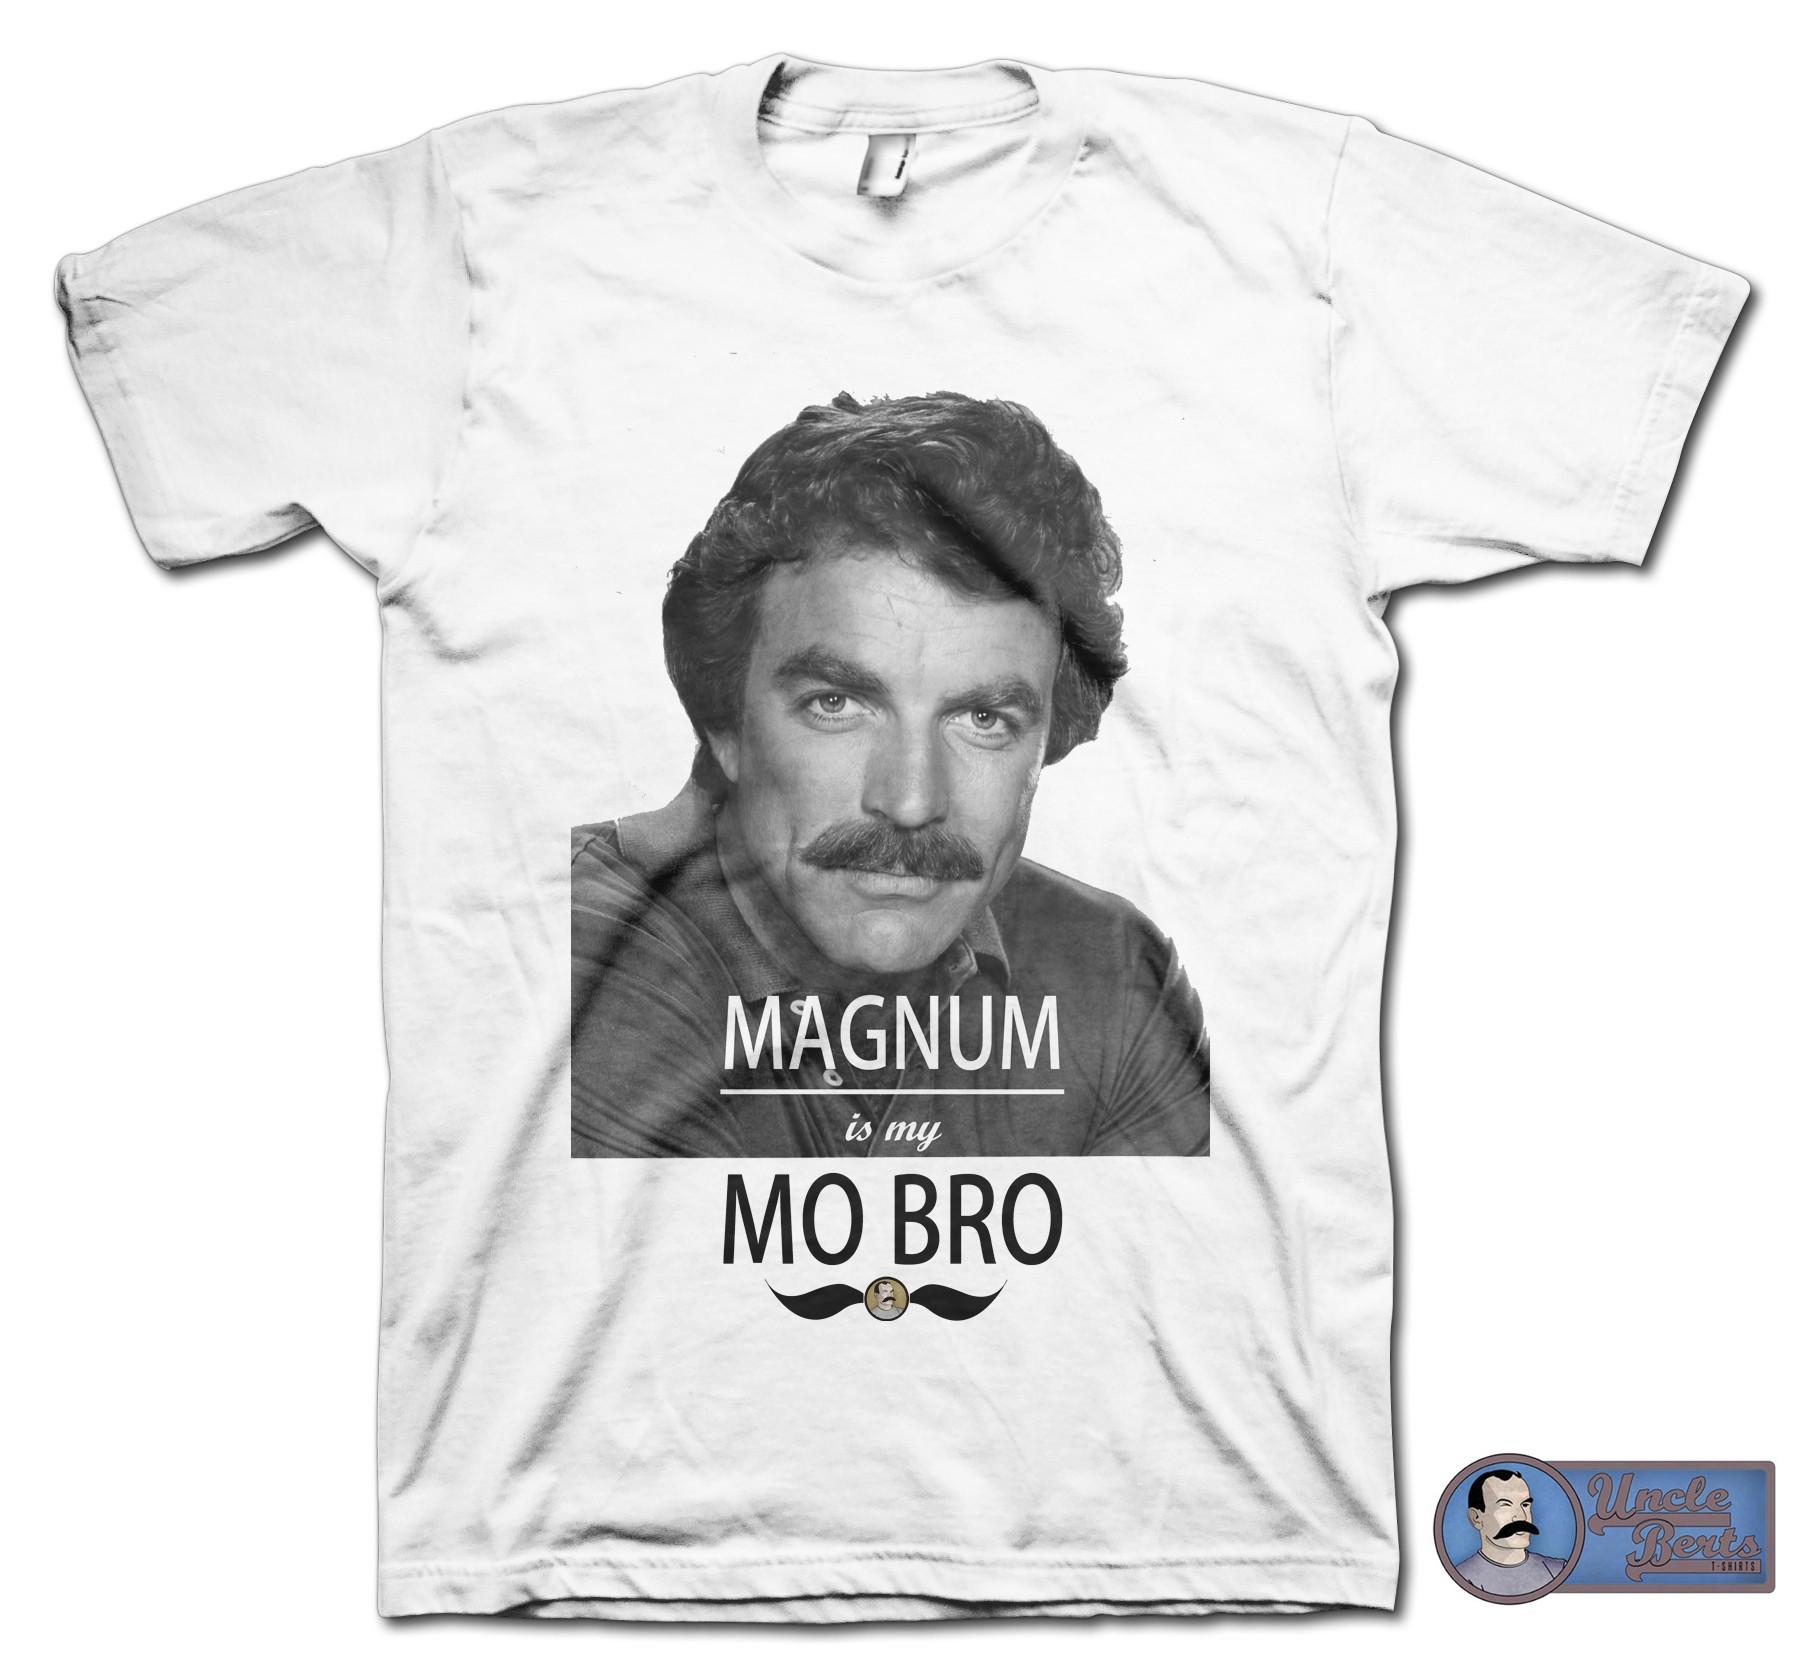 MAGNUM is my MO BRO T-shirt